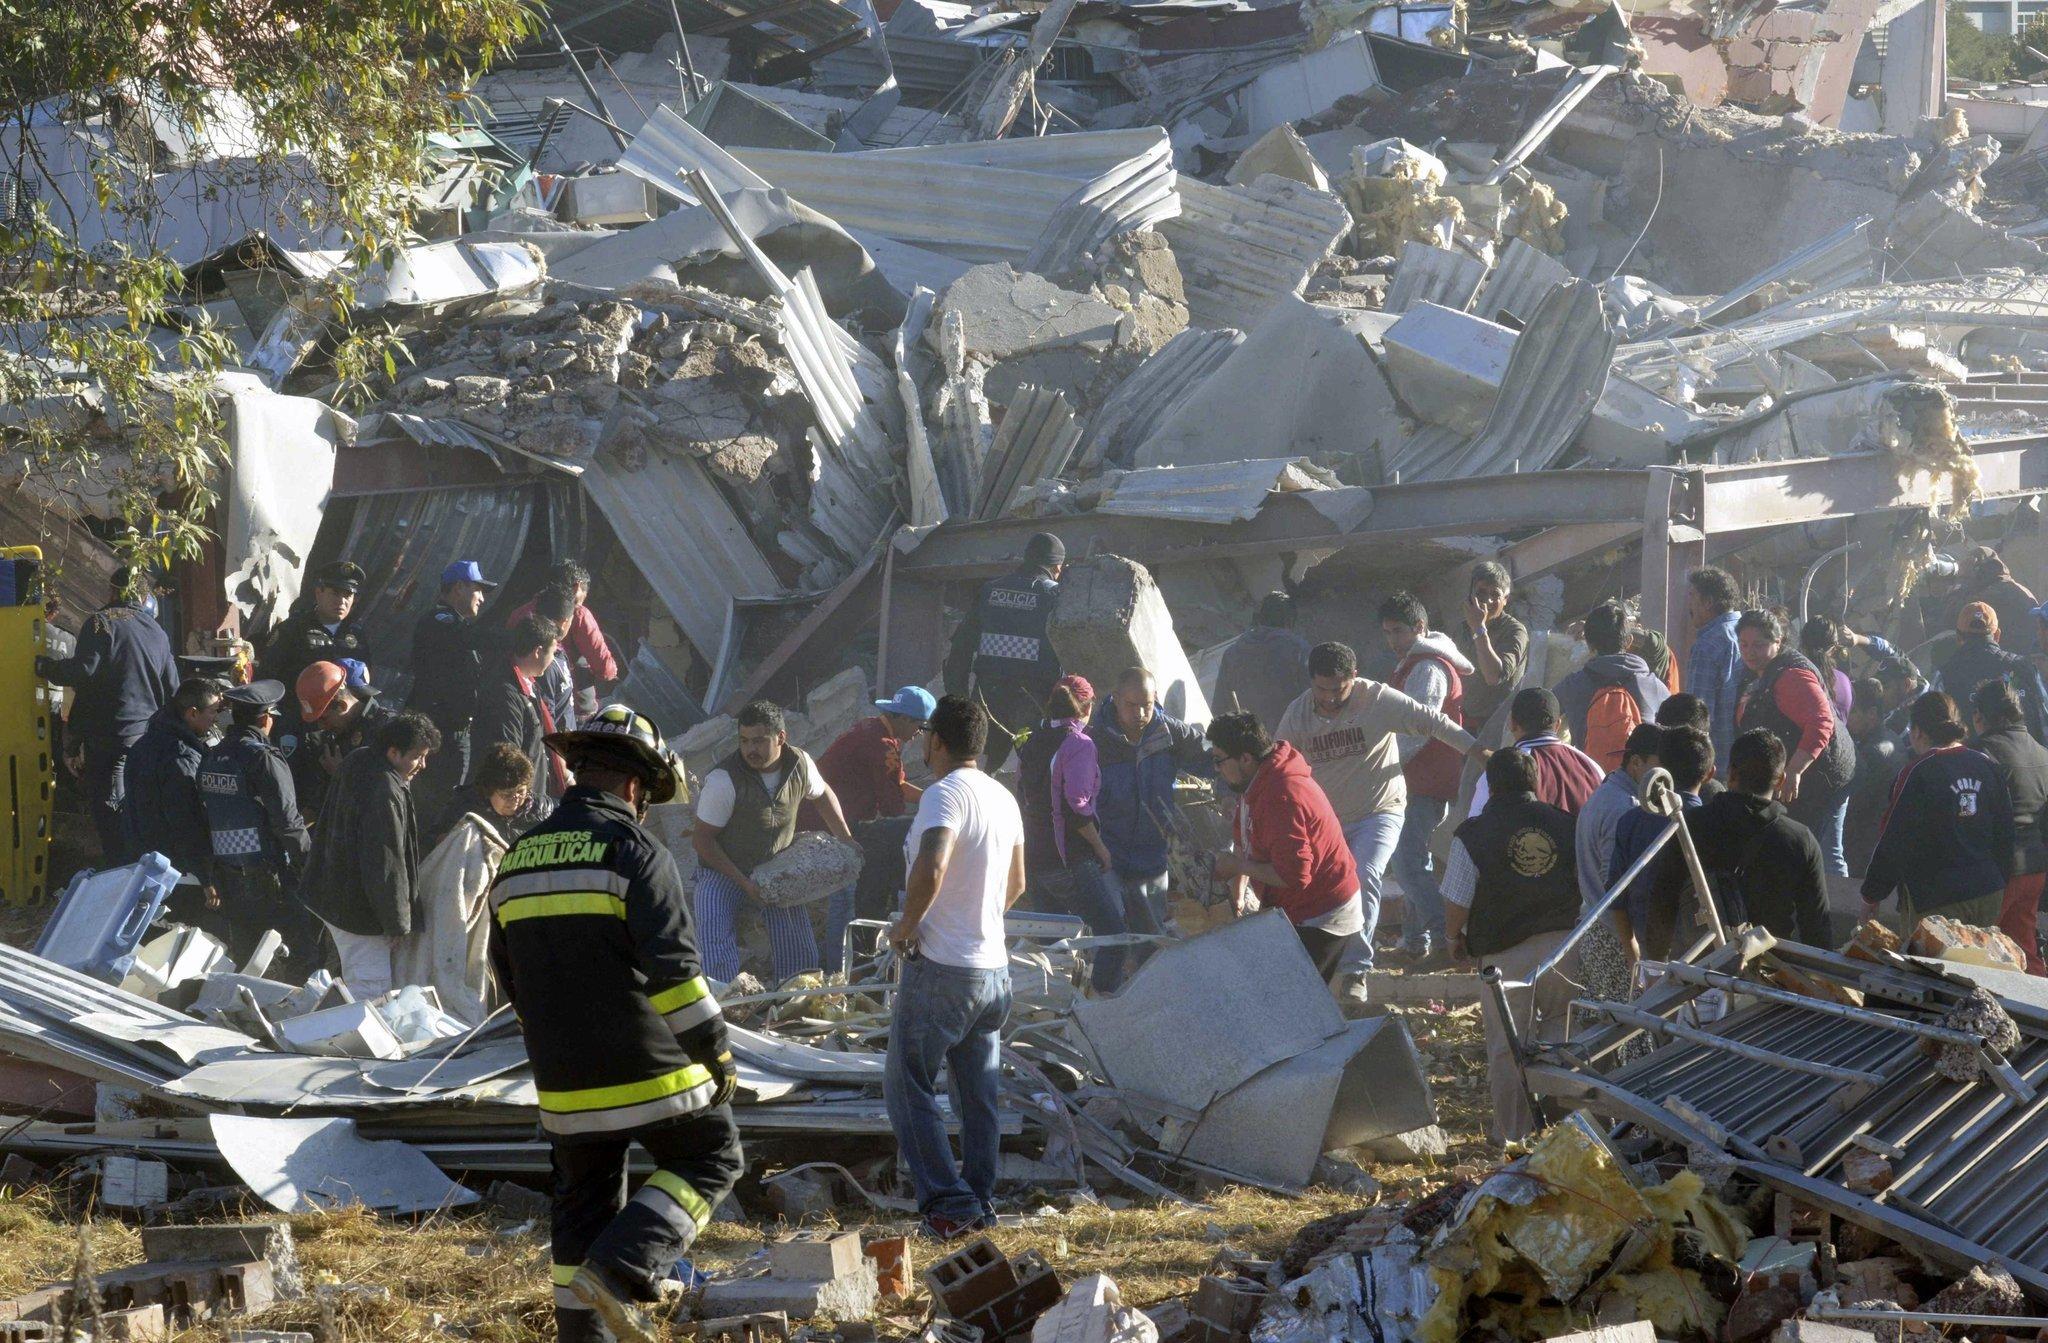 Mexico hospital blast leaves at least 2 dead, dozens hurt